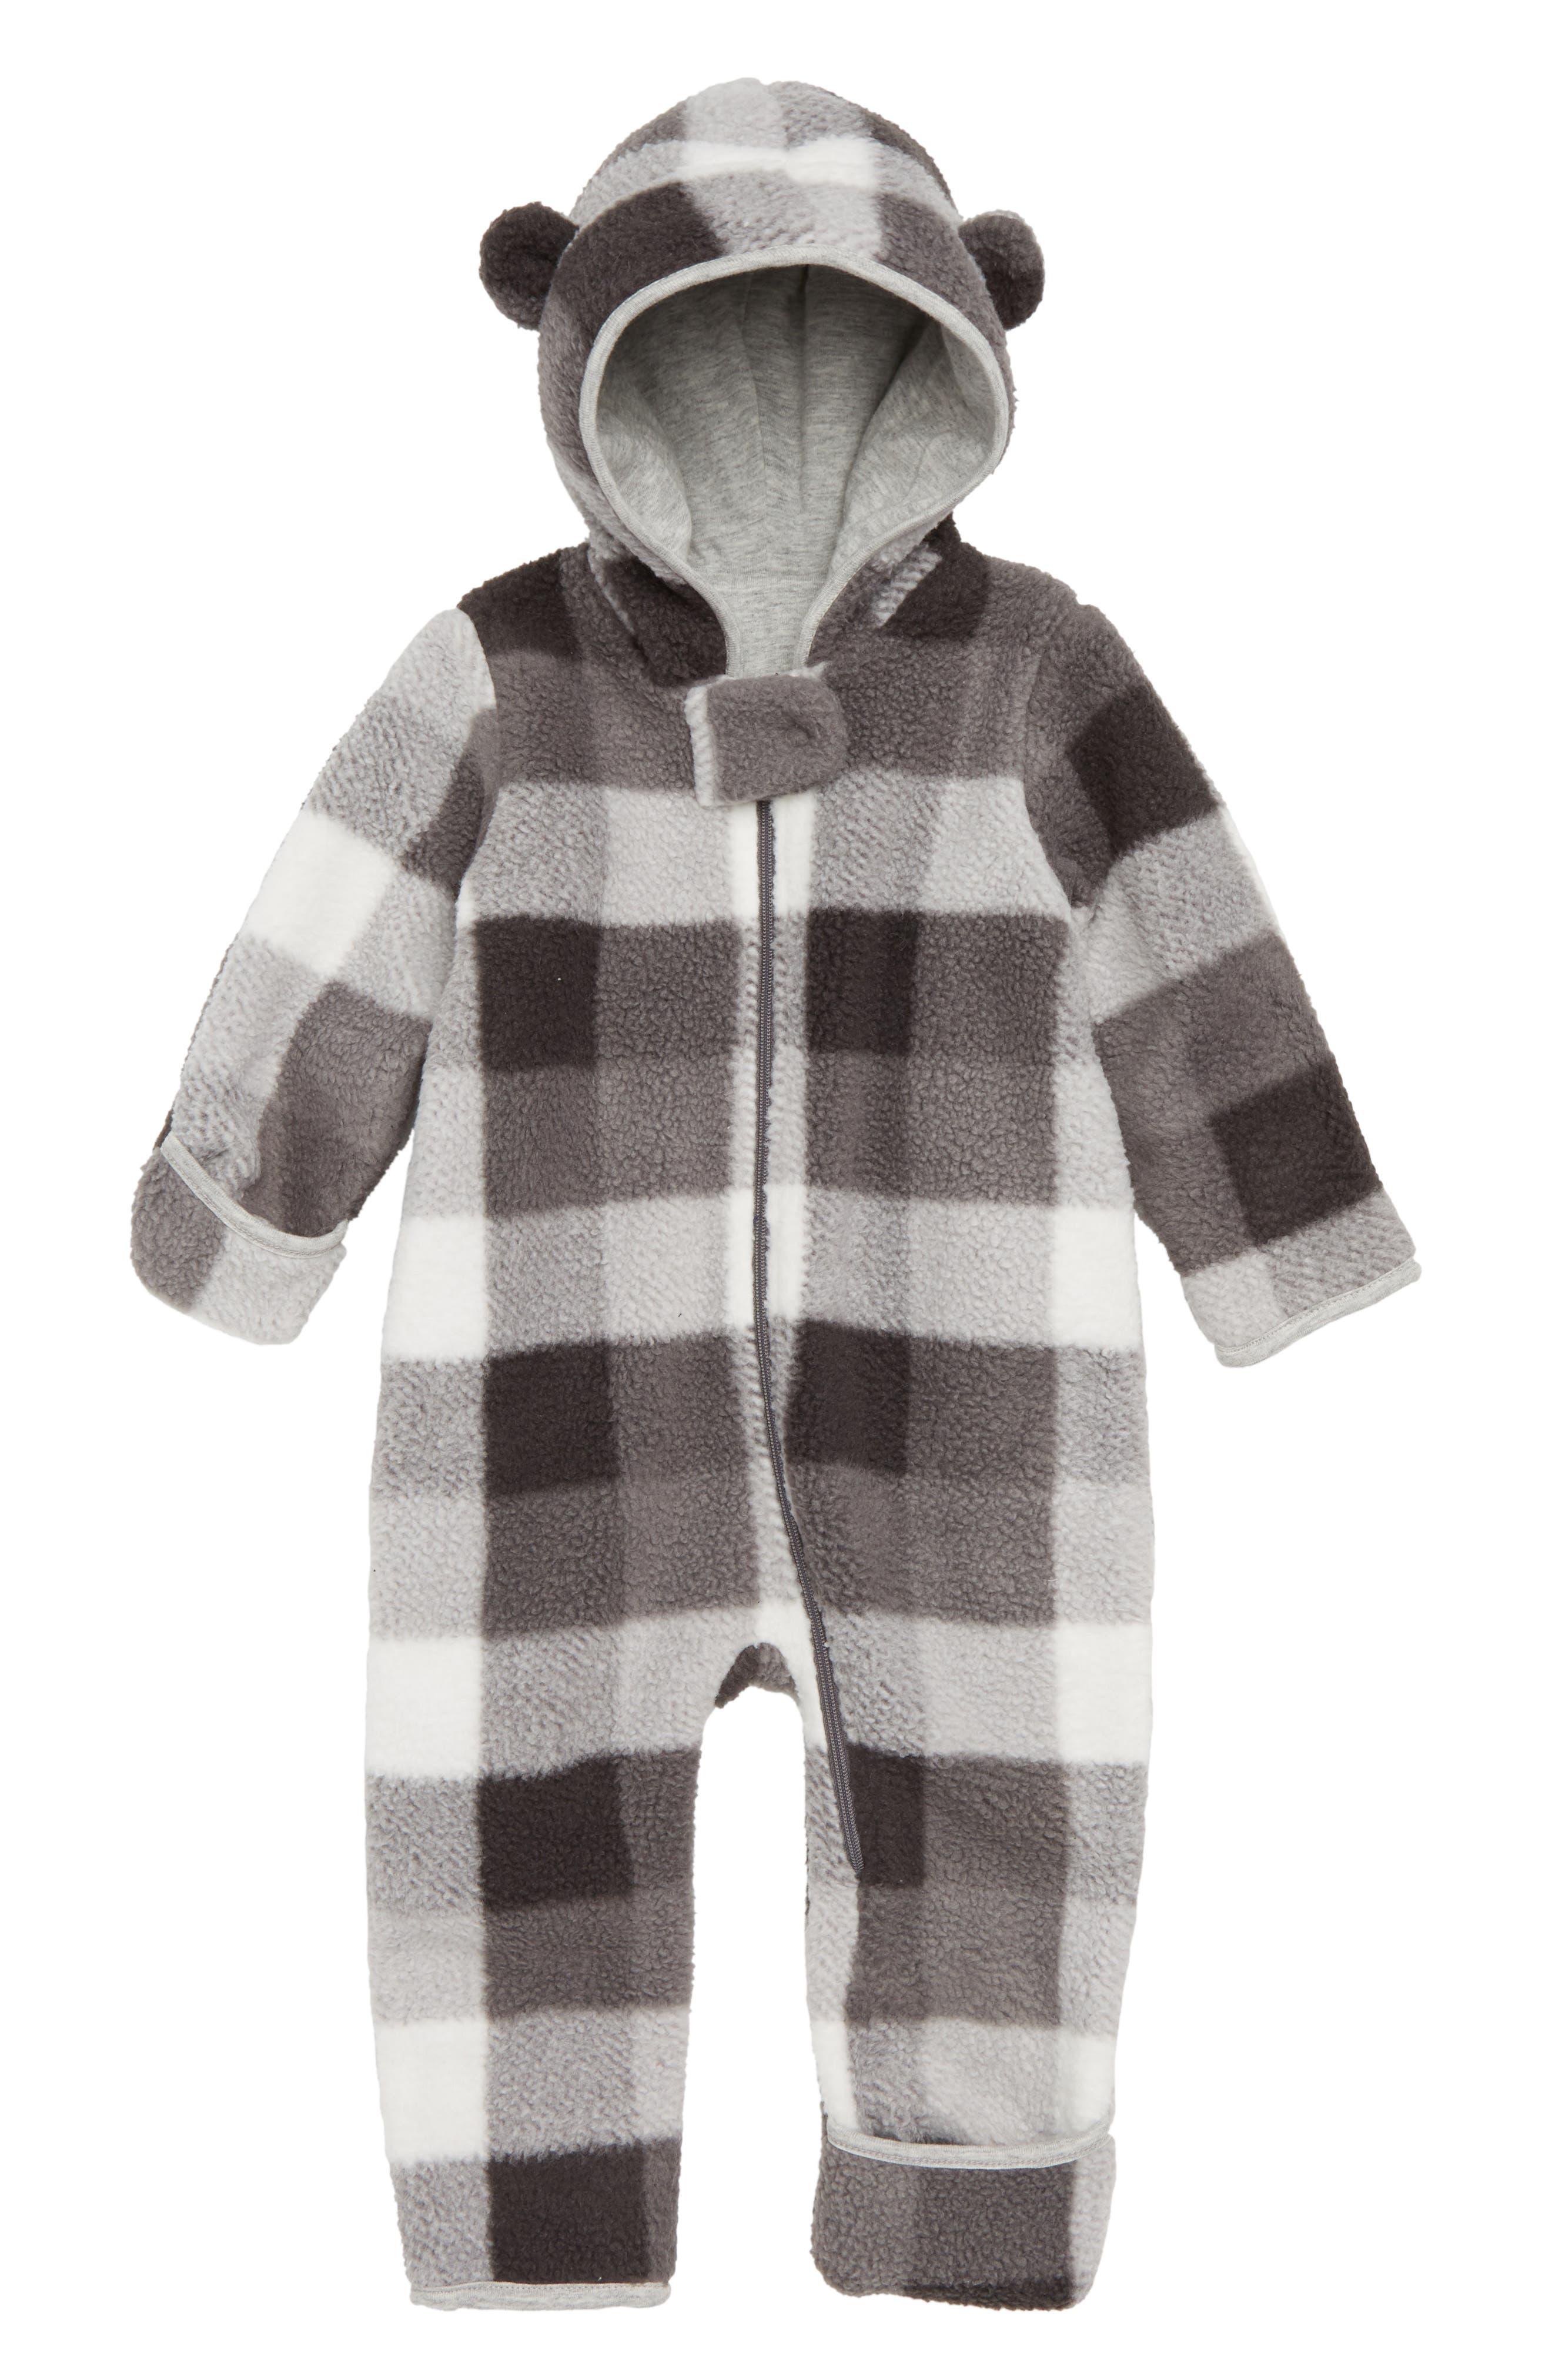 Check Fleece Hooded Bunting,                             Main thumbnail 1, color,                             IVORY EGRET- GREY CHECK